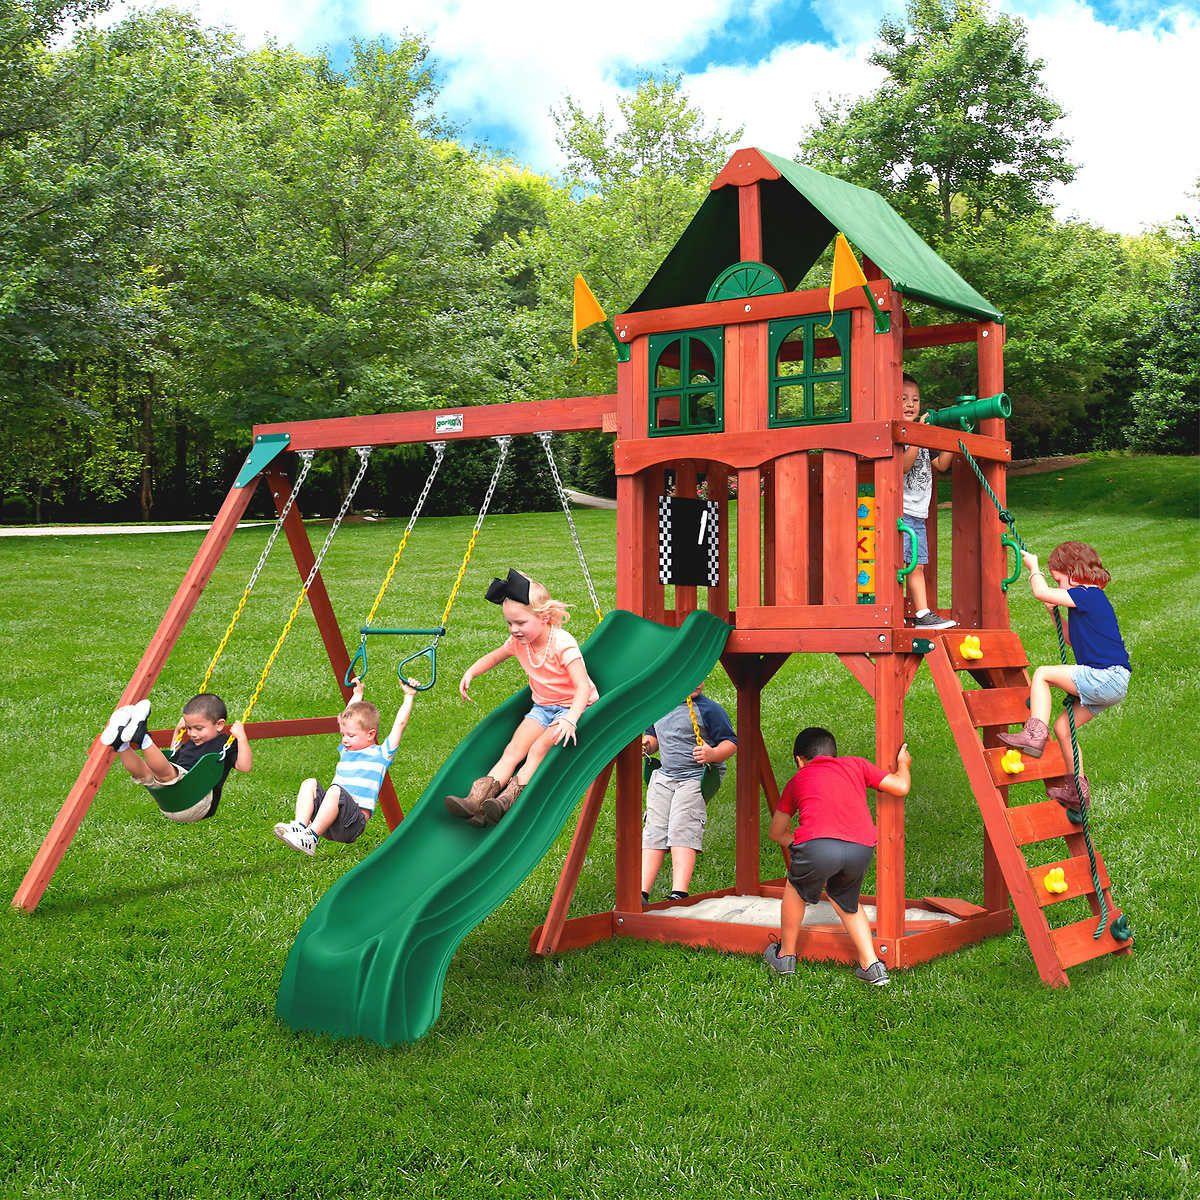 Enjoyable Gorilla Playsets Playmaker Ii Playset Do It Yourself Or Interior Design Ideas Philsoteloinfo